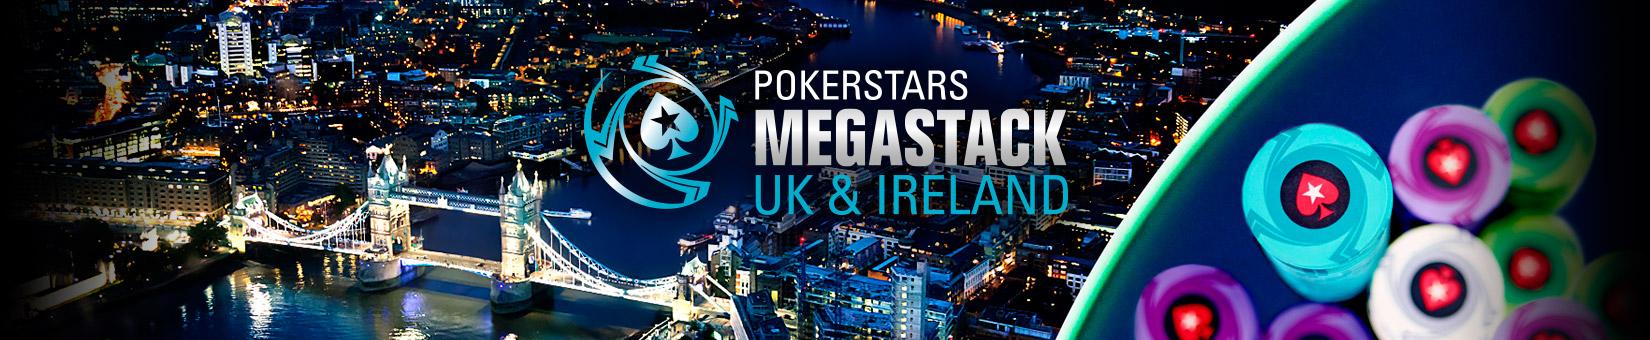 PokerStars MEGASTACK Англия и Ирландия